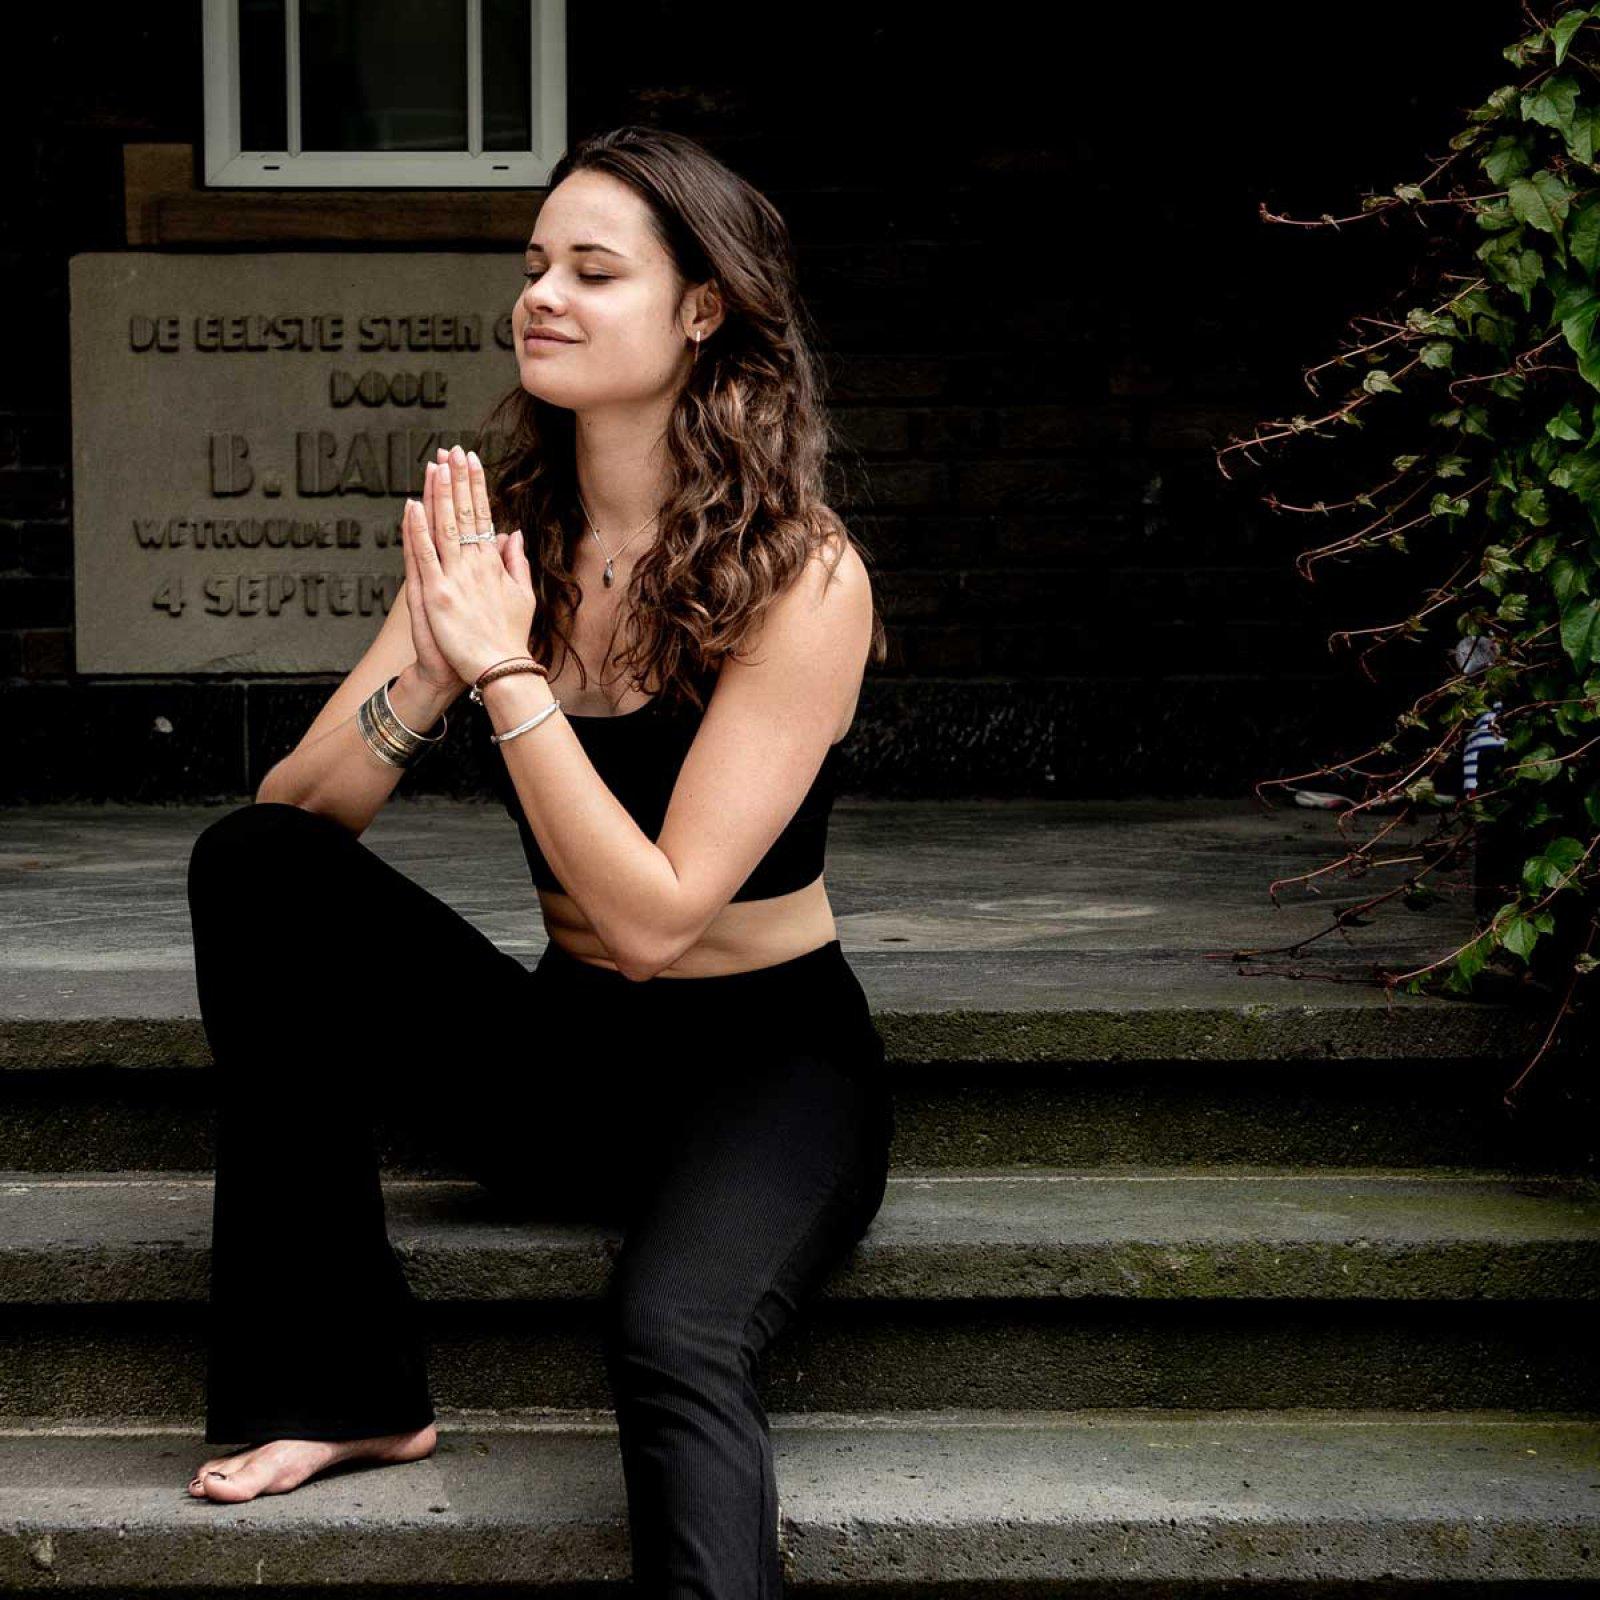 #5 Hoe je dankzij yoga sneller herstelt